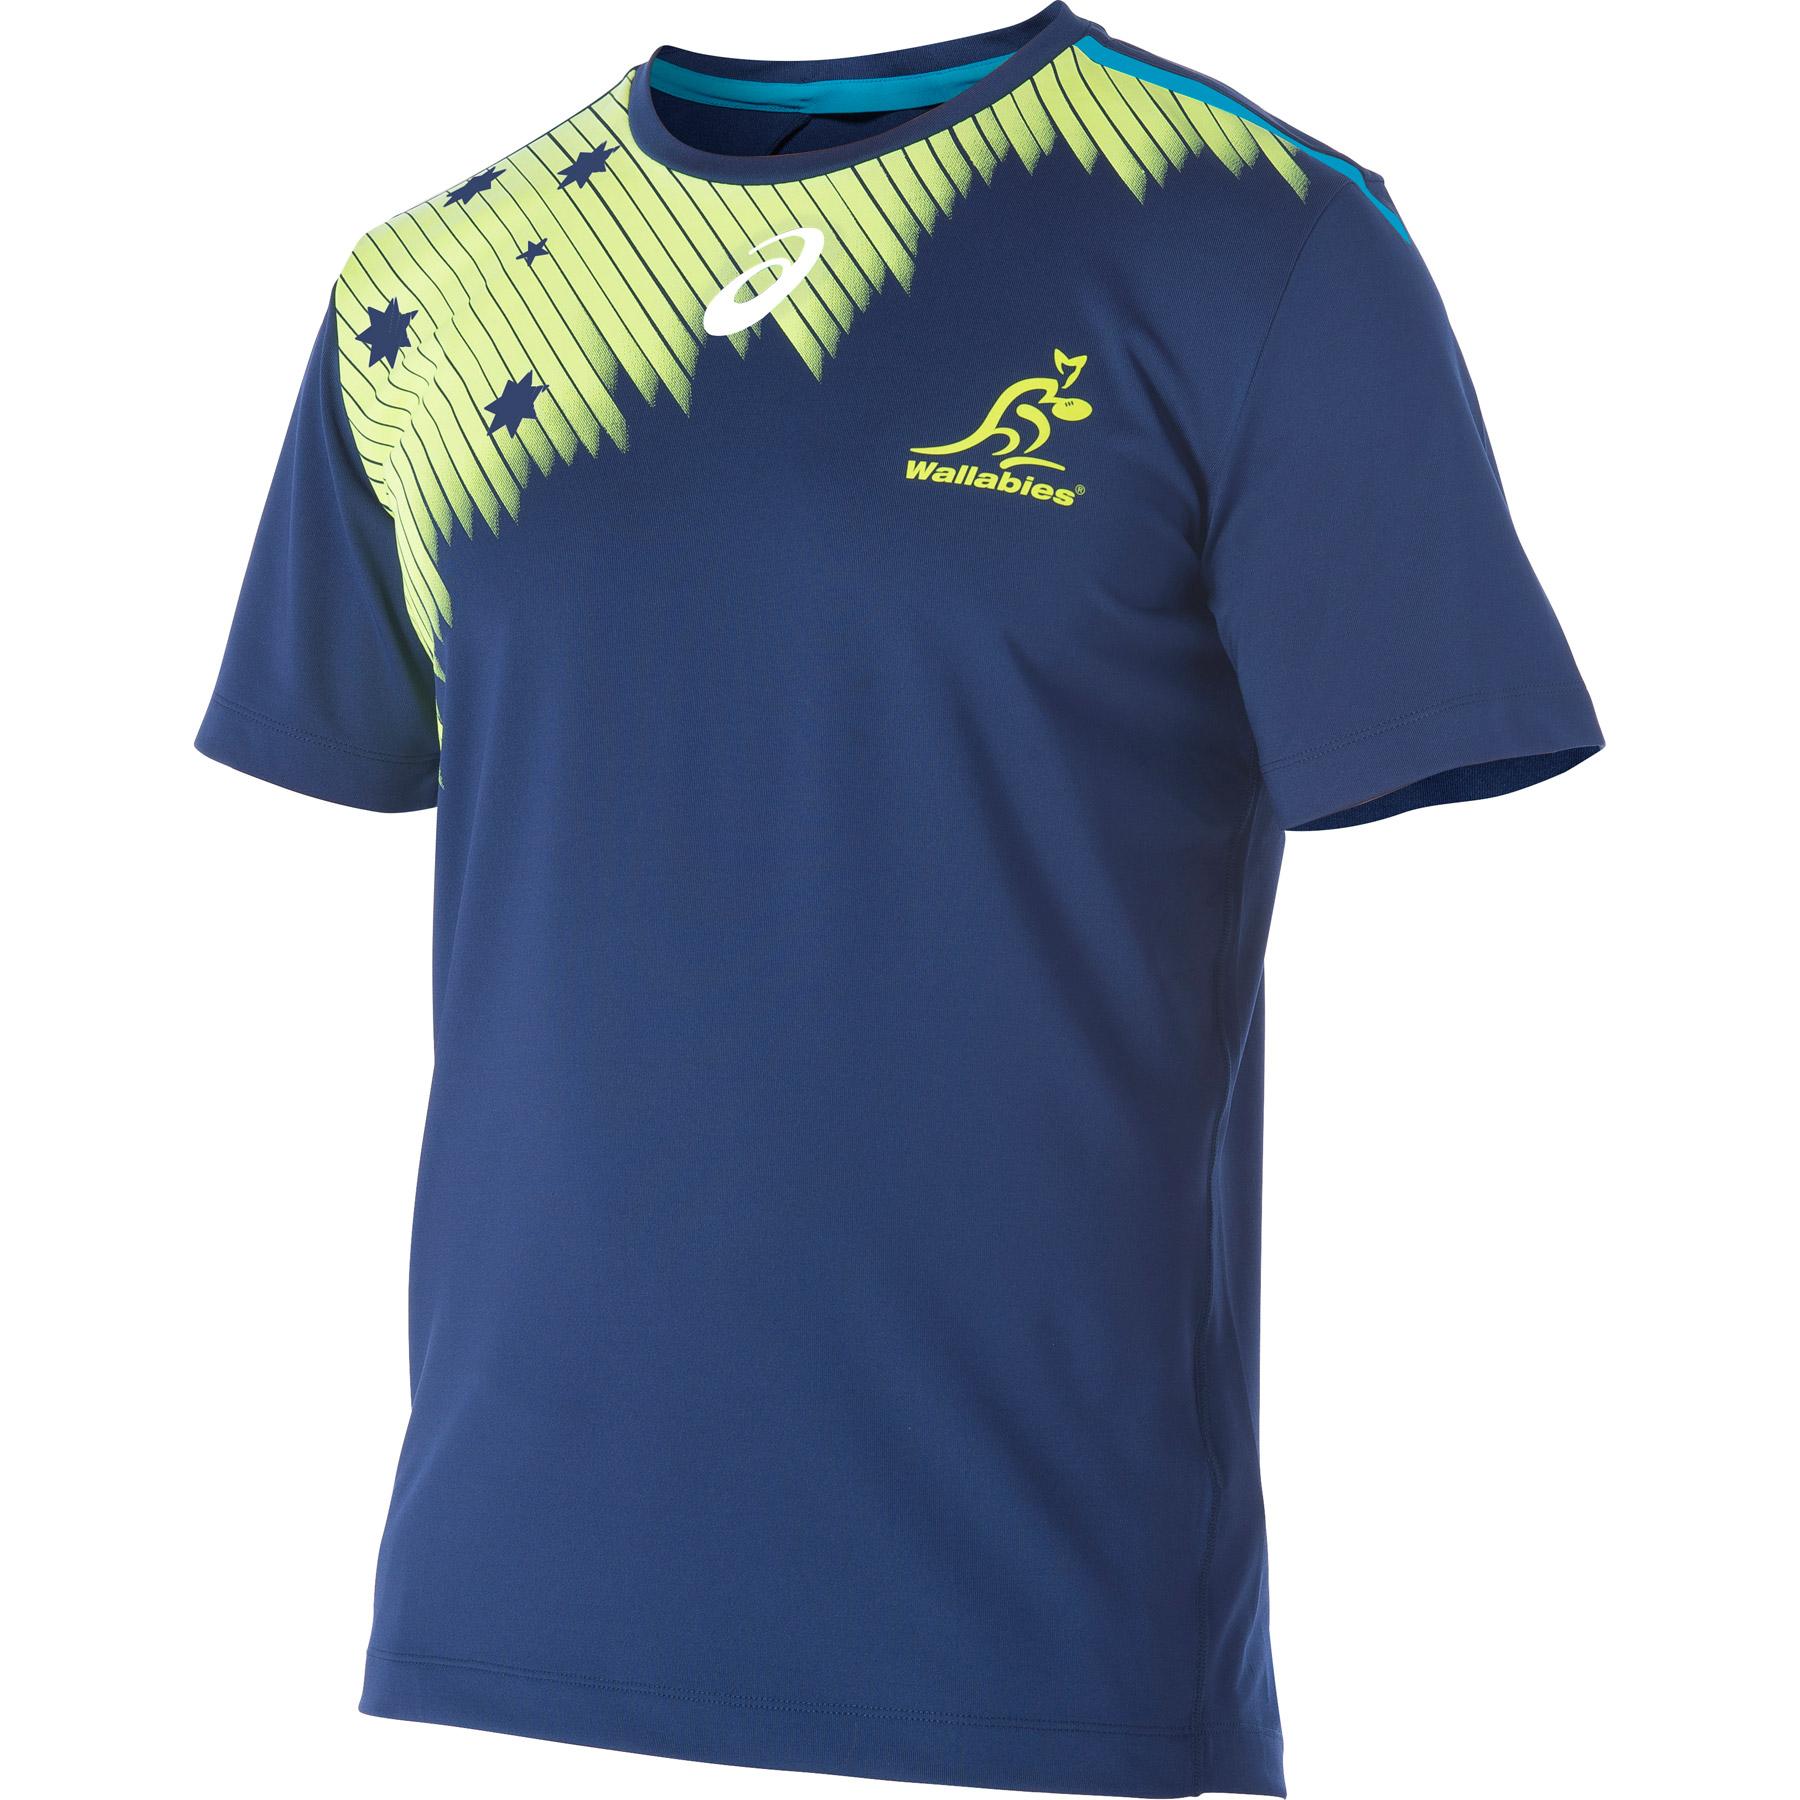 Australia Wallabies Rugby Short Sleeve Training TShirt Blue